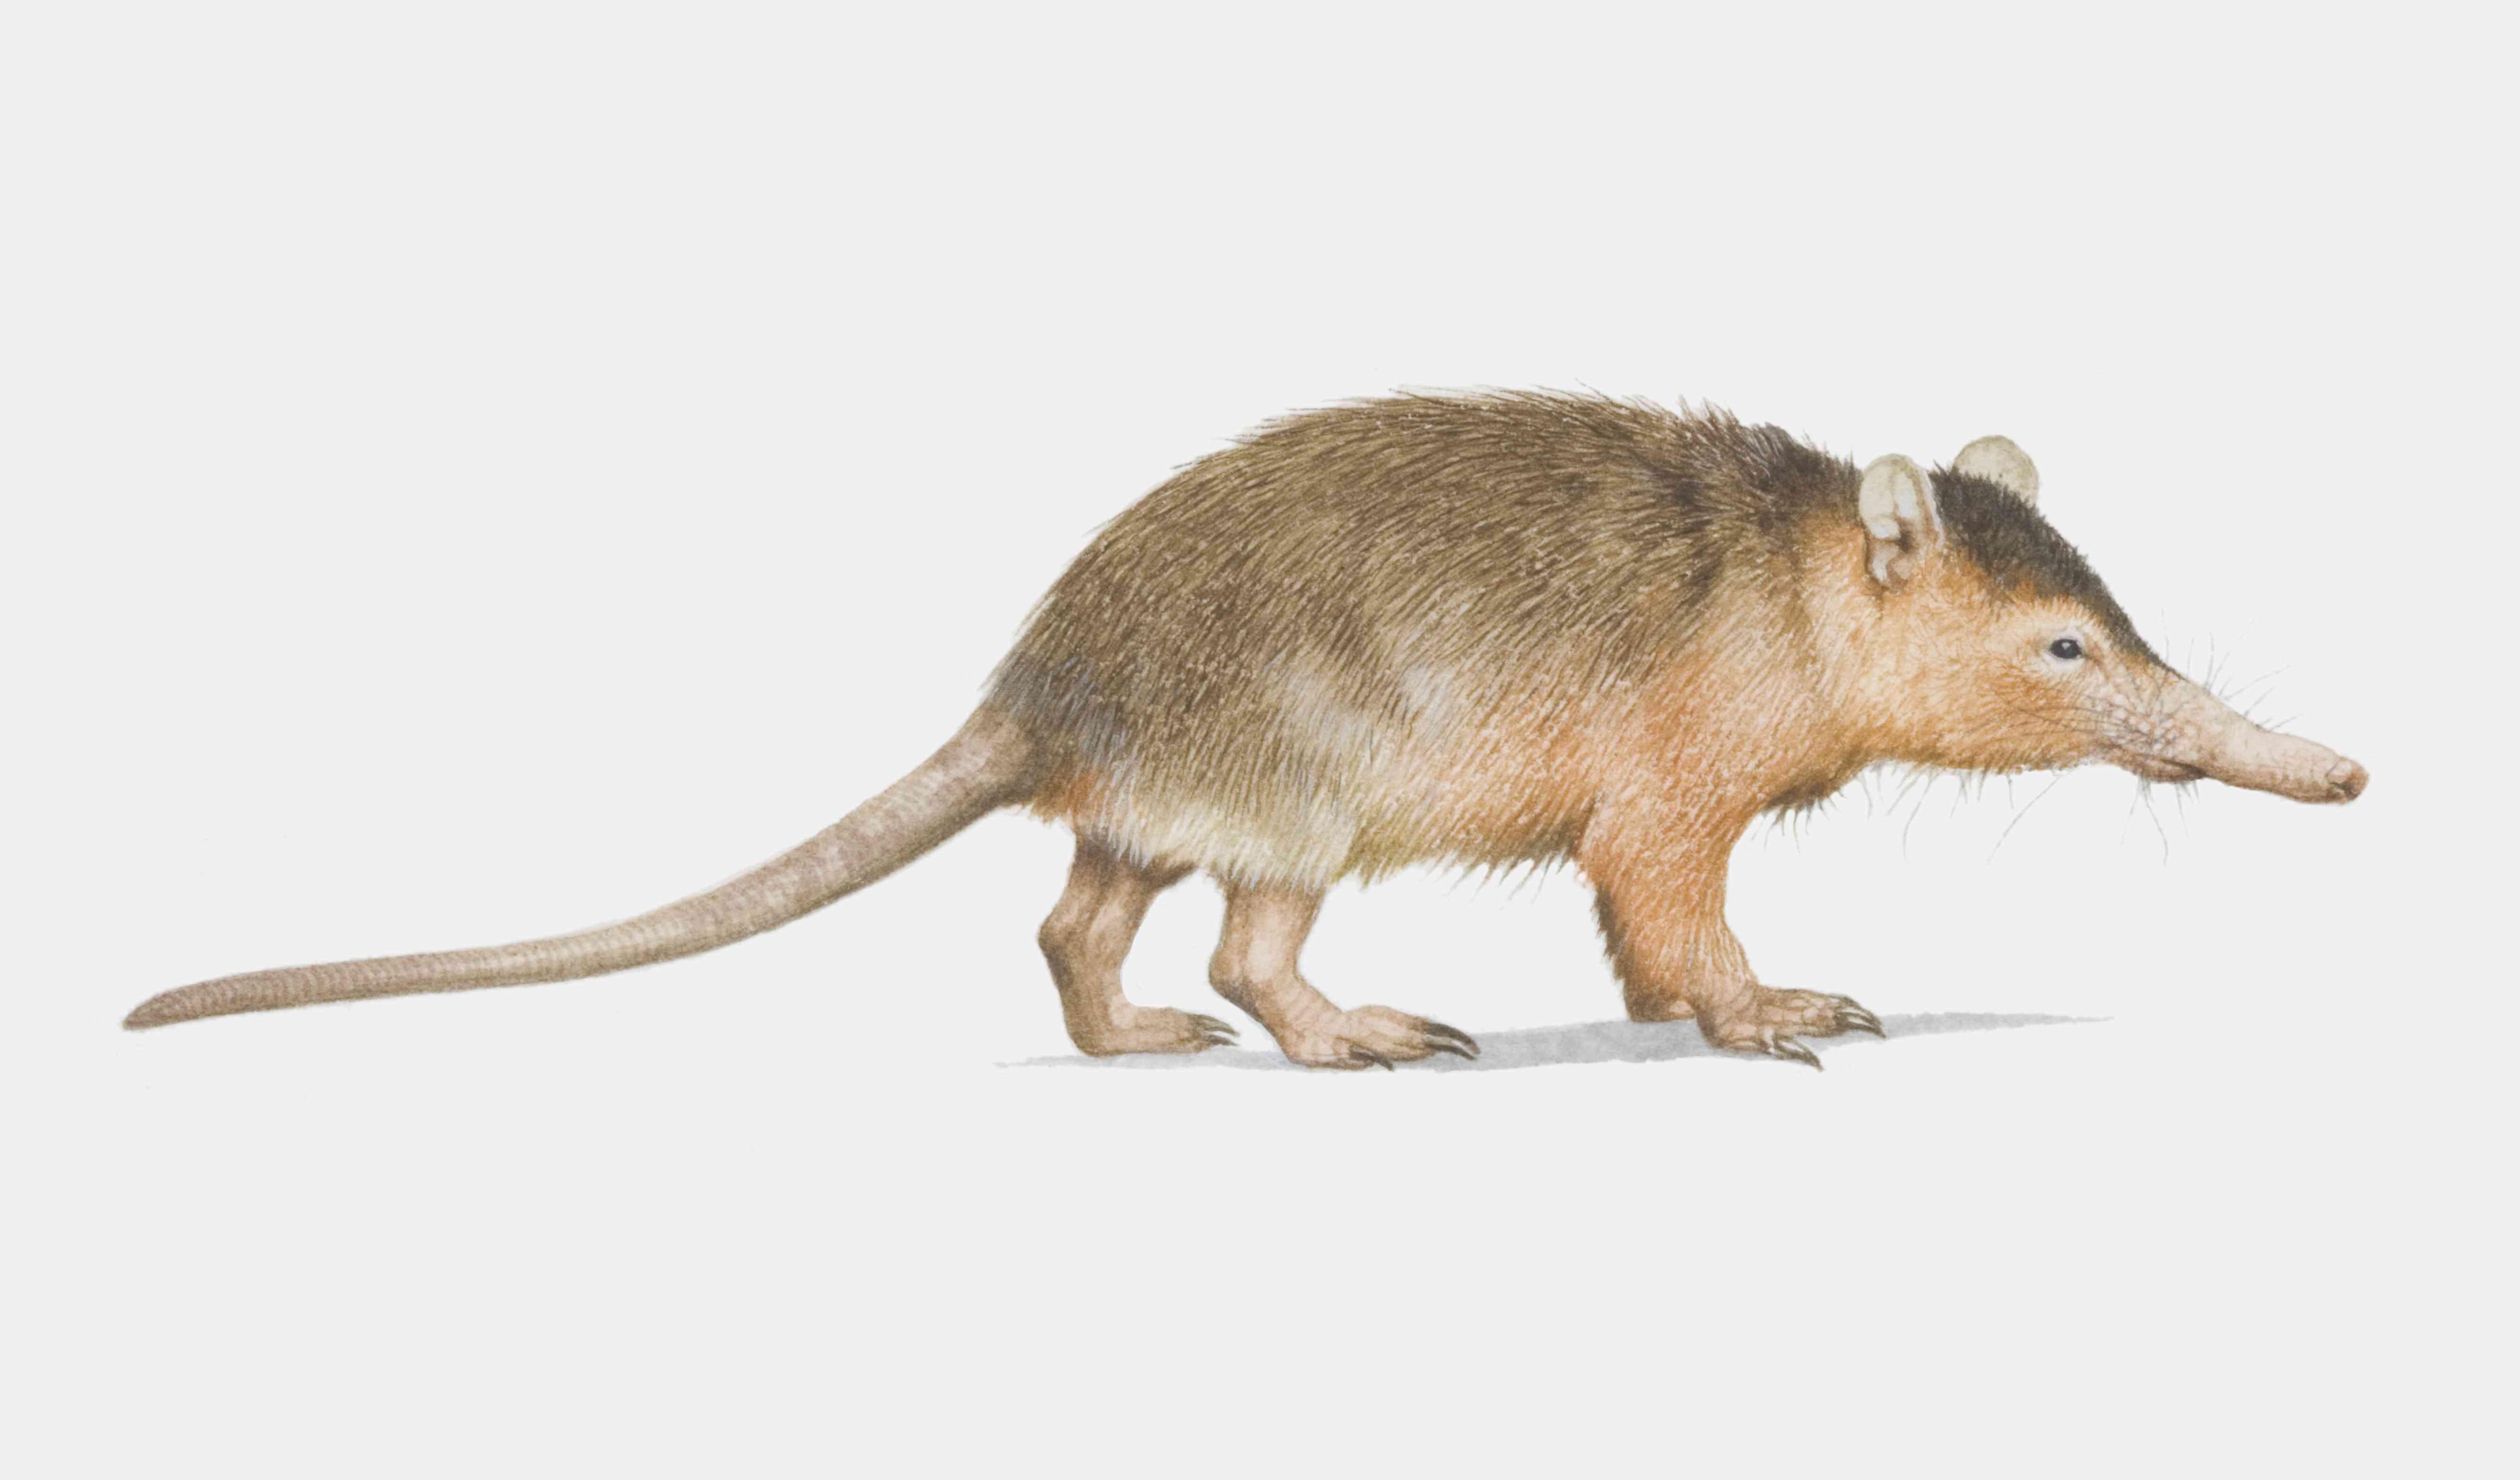 Illustration, Solenodon (Solenodon cubanus), side view.